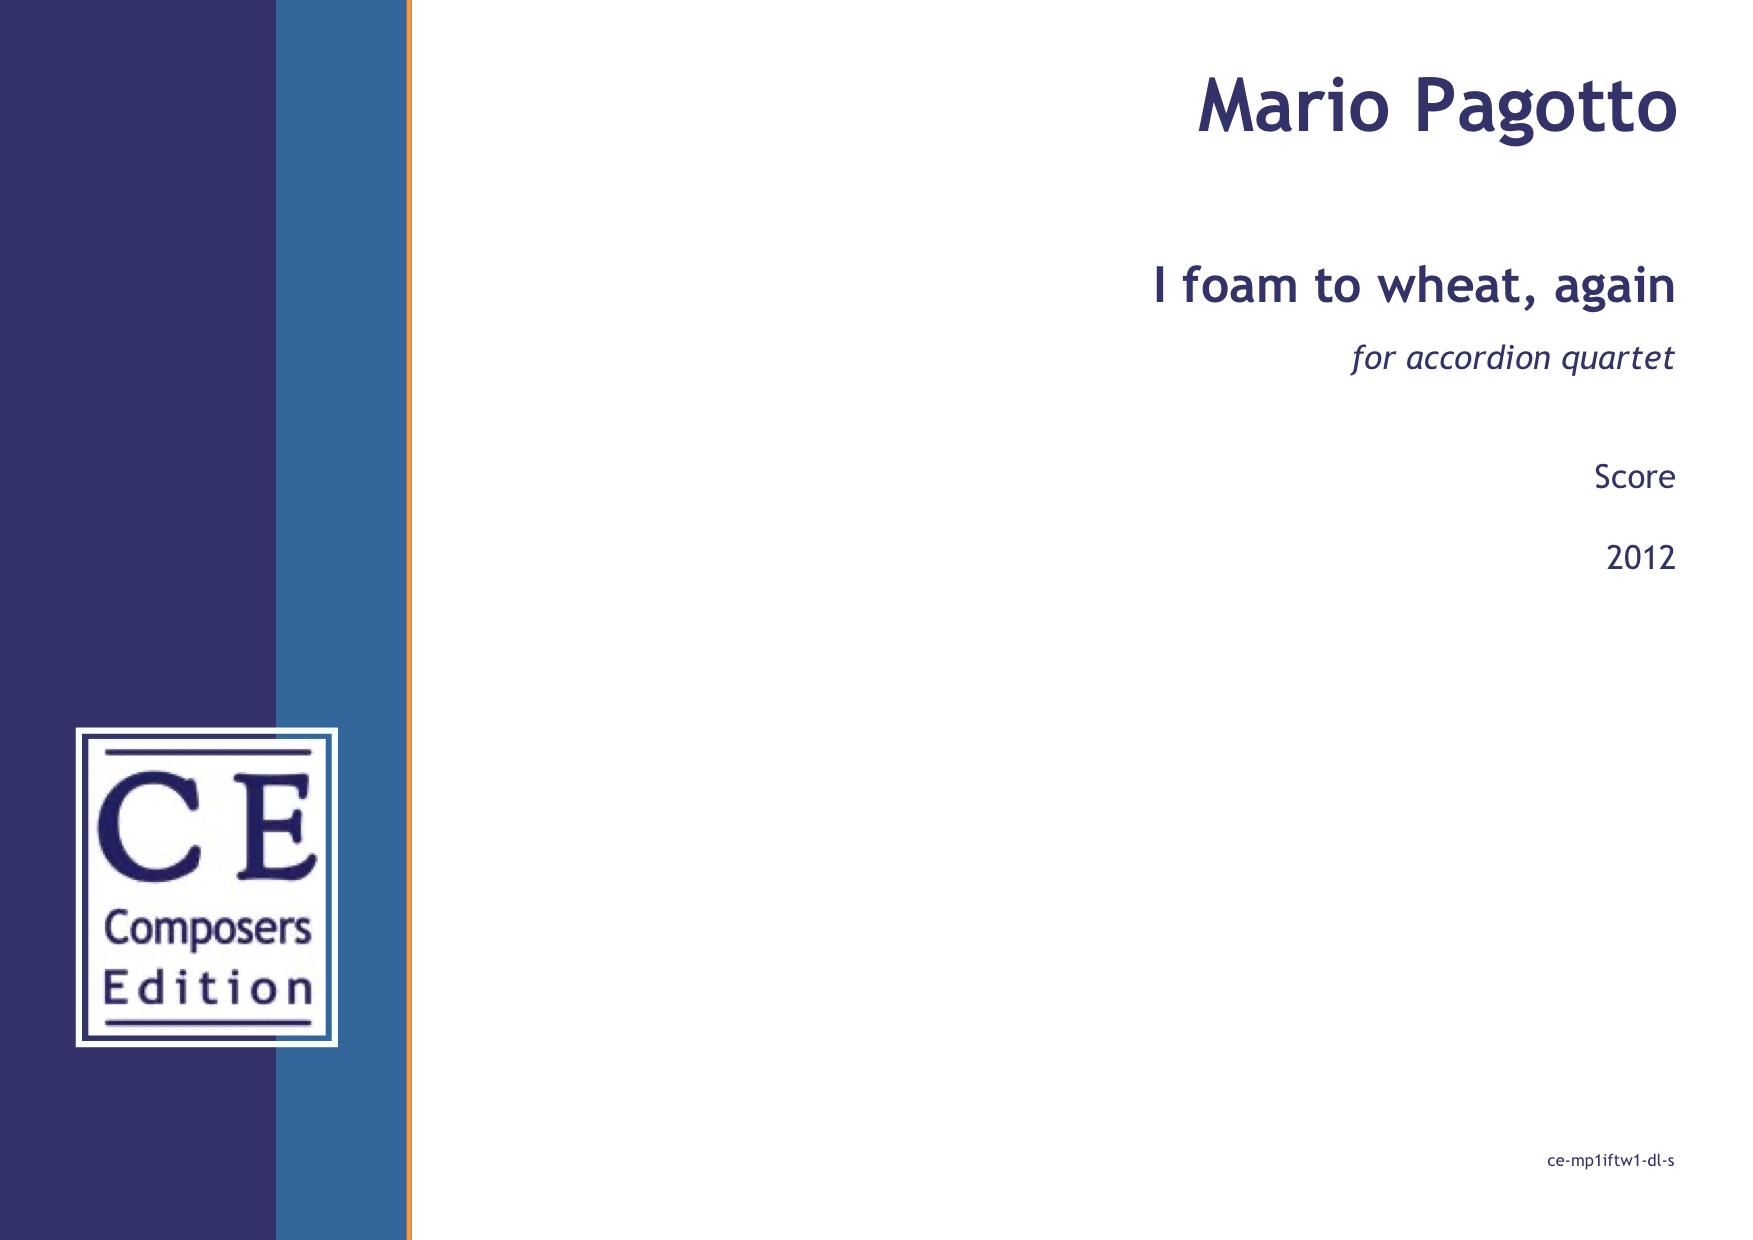 Mario Pagotto: I foam to wheat, again for accordion quartet